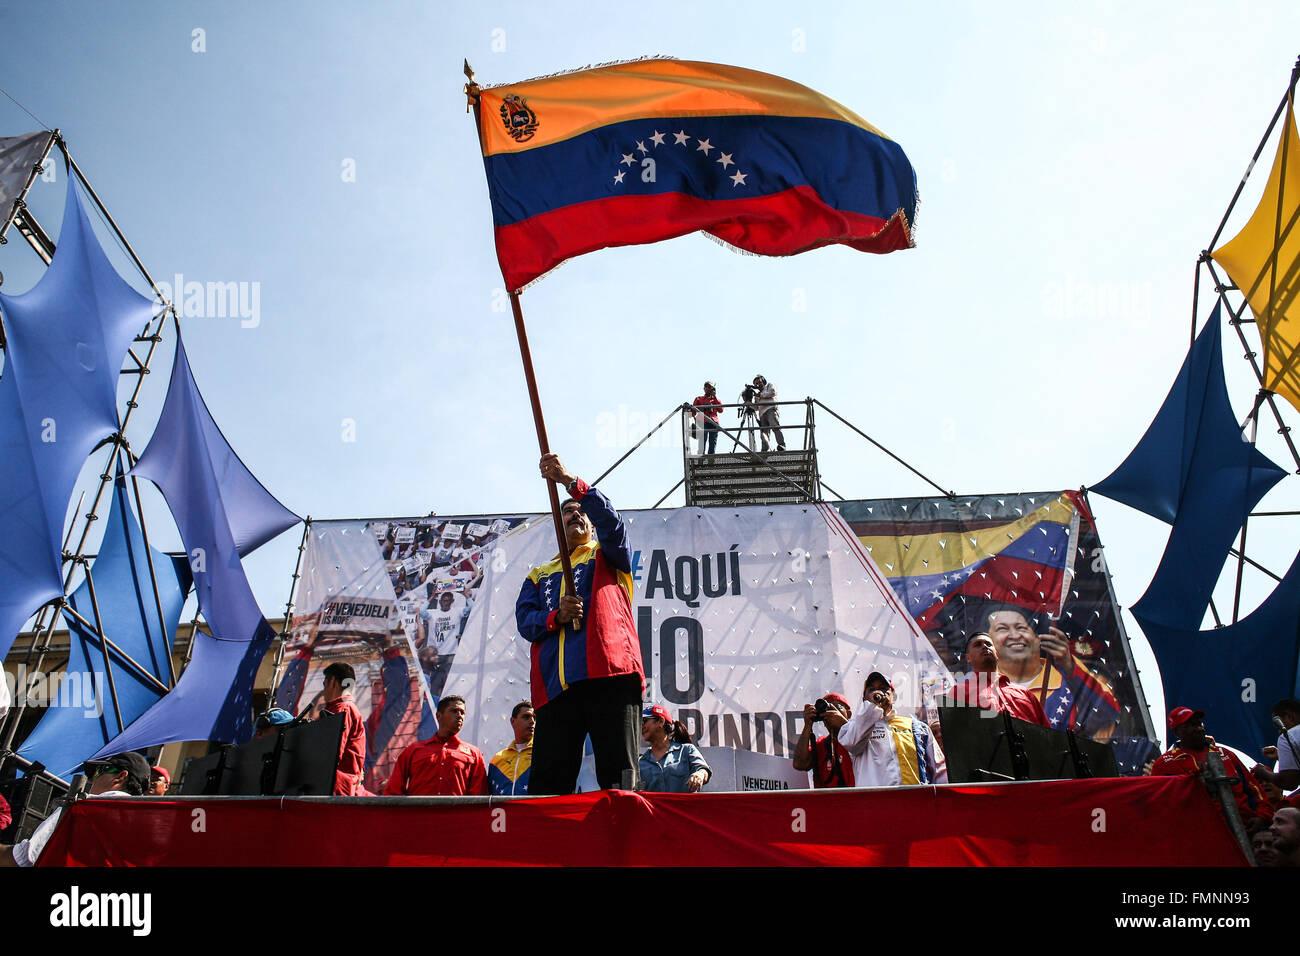 Caracas, Venezuela. 12th Mar, 2016. Venezuela's President Nicolas Maduro(C) waves a Venezuelan national flag - Stock Image